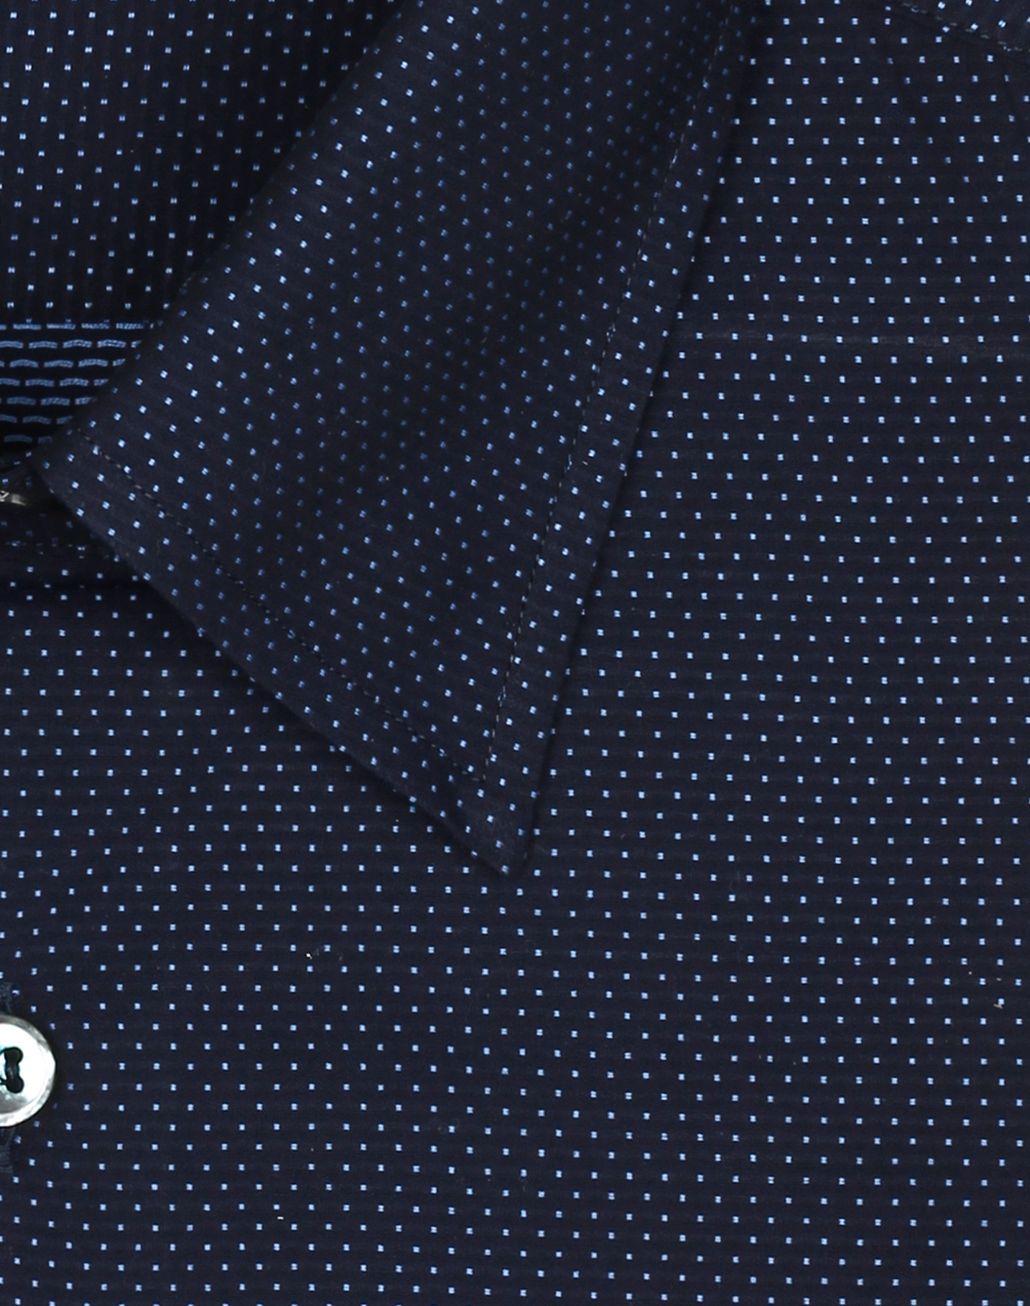 BRIONI Тёмно-синяя рубашка в мелкий горошек Повседневная рубашка [*** pickupInStoreShippingNotGuaranteed_info ***] e